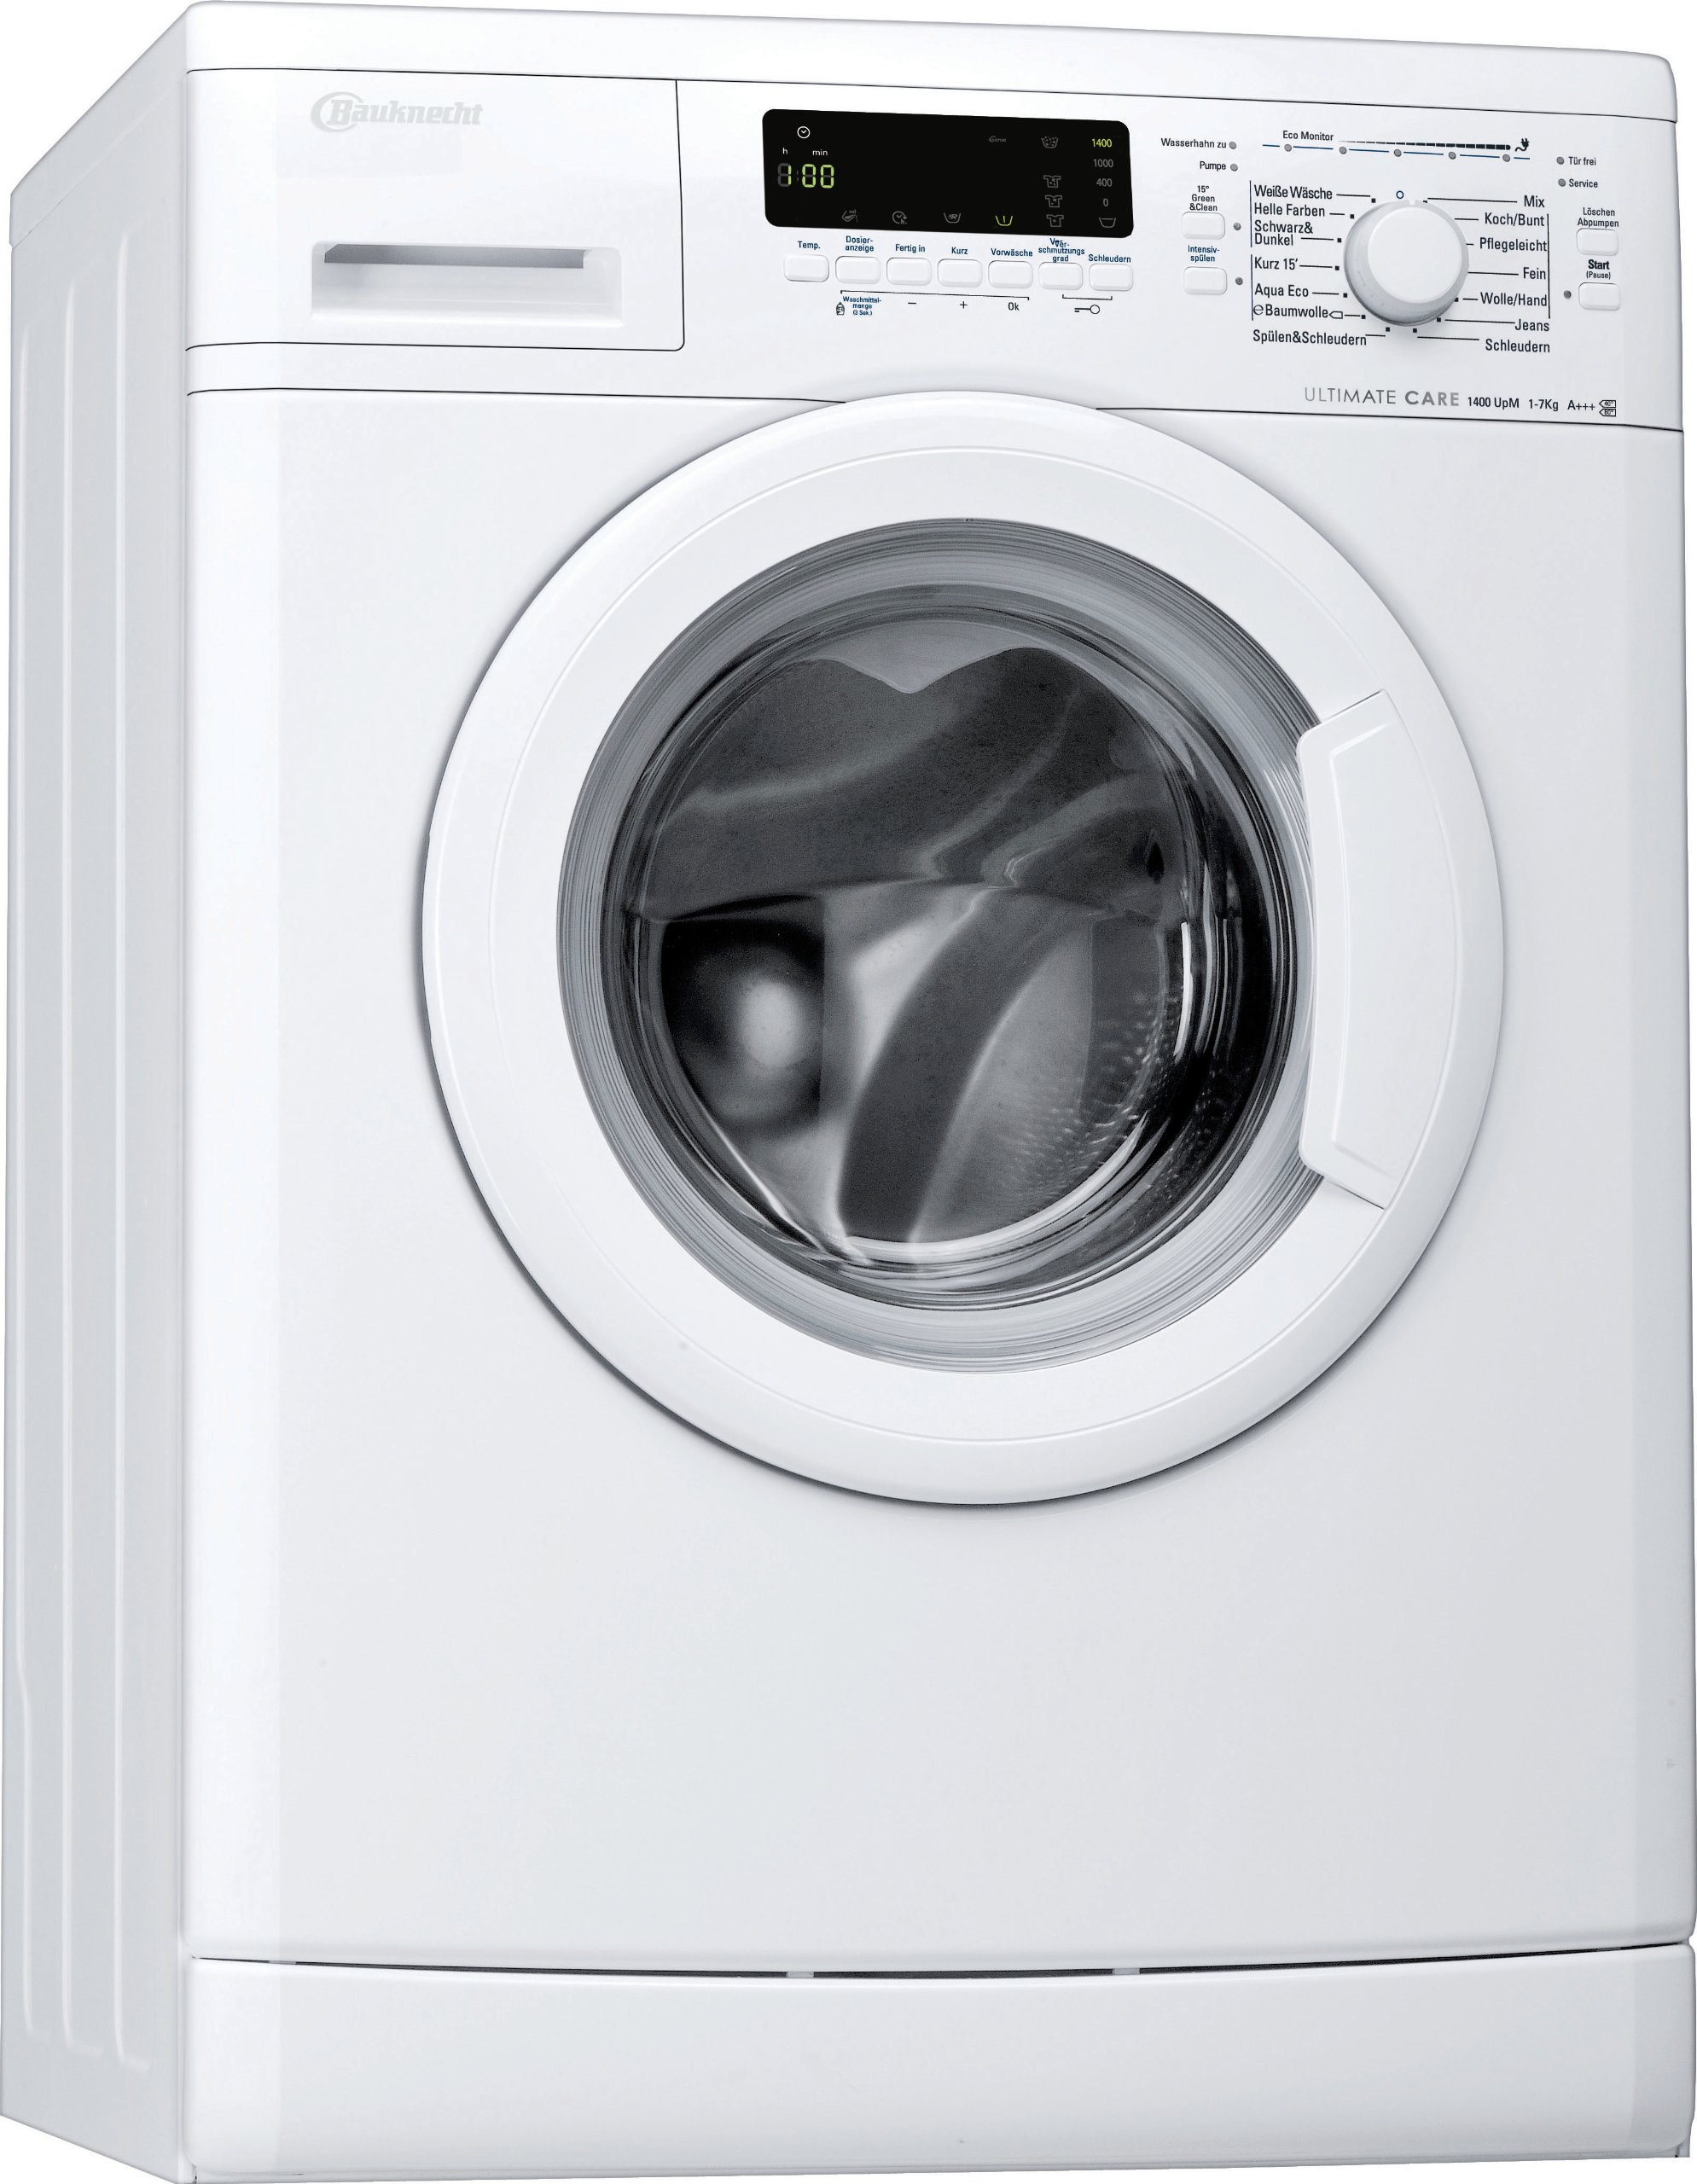 Bauknecht-WA-Eco-Star-74-PS-Waschmaschine-Frontlader-A-B-1400-UpM-7-kg-Wei-UltimateCare-Schontrommel-ProSilentMotor